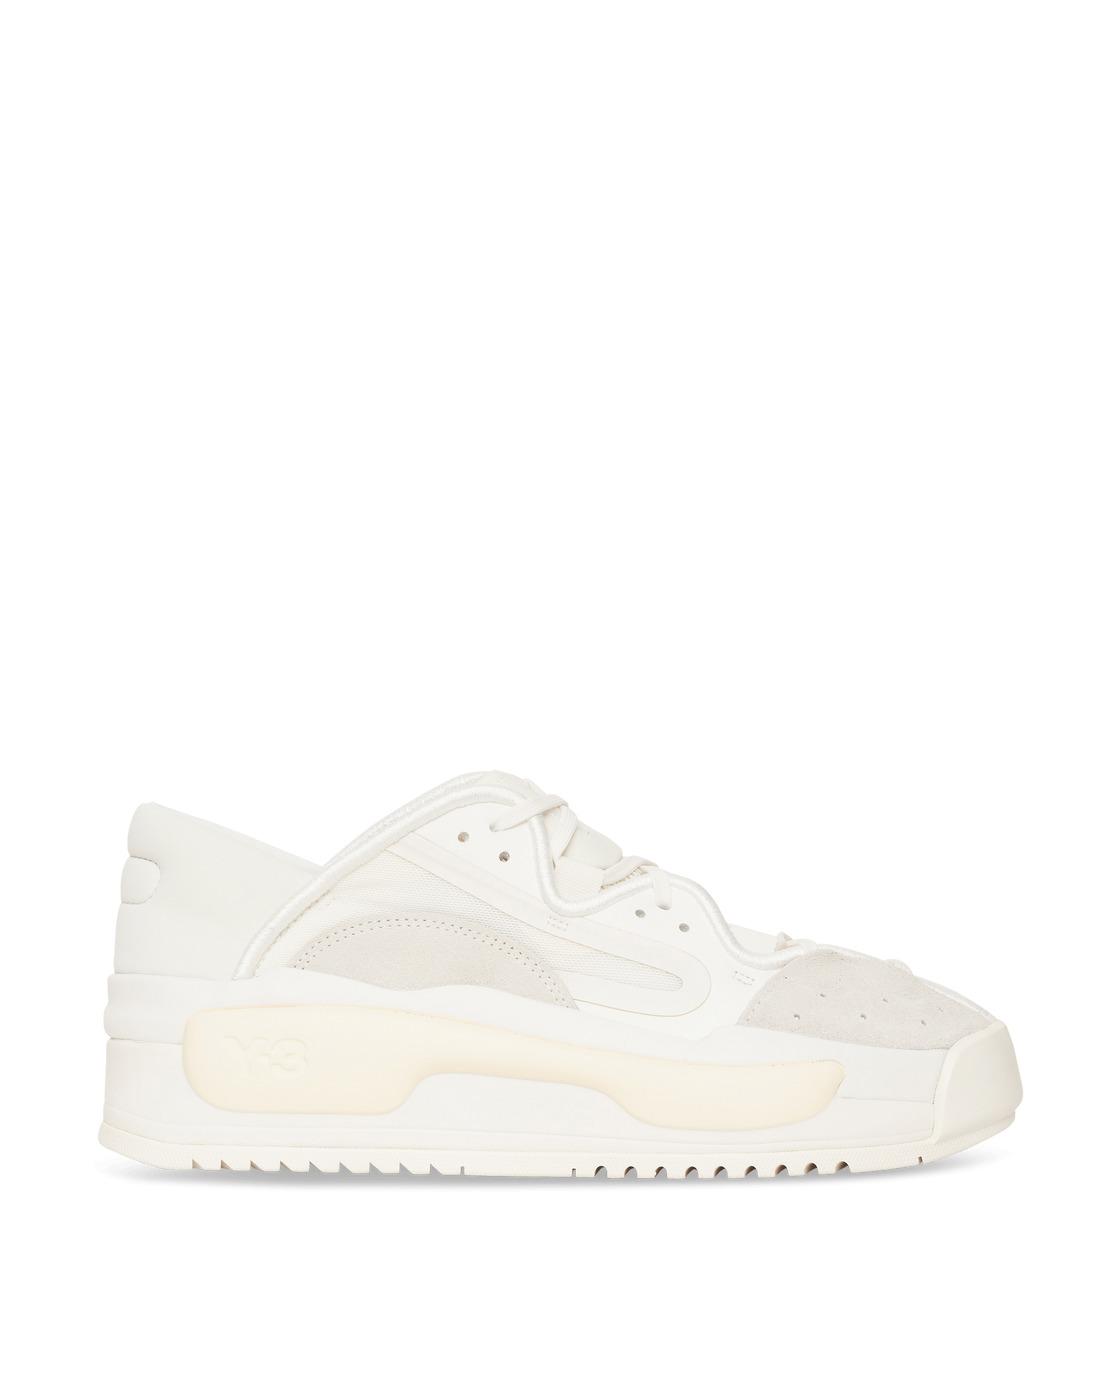 Photo: Y 3 Hokori Ii Sneakers White/Ecru